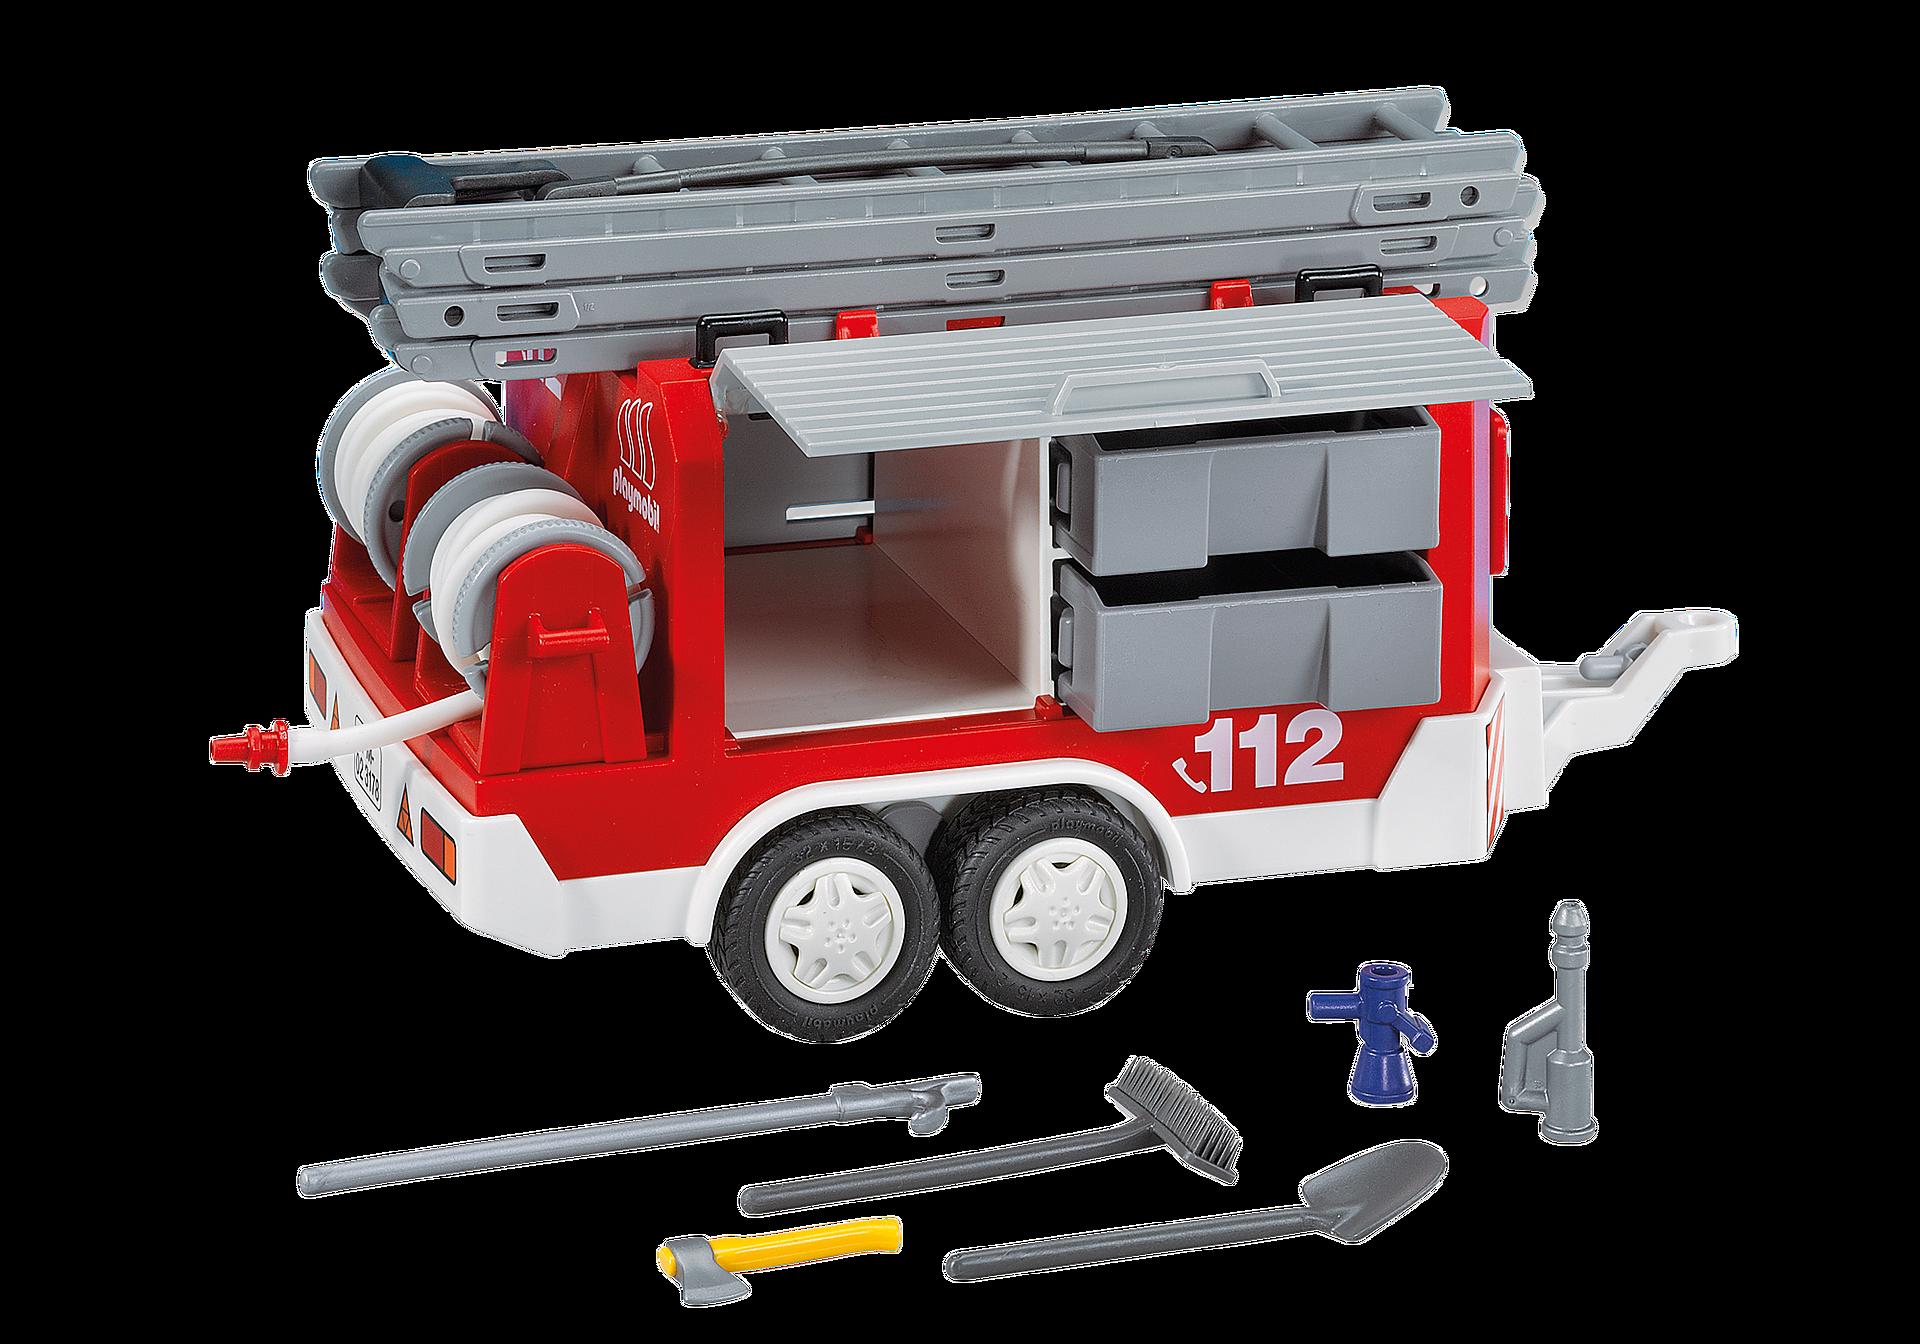 http://media.playmobil.com/i/playmobil/7485_product_detail/Påhængsvogn til brandbil